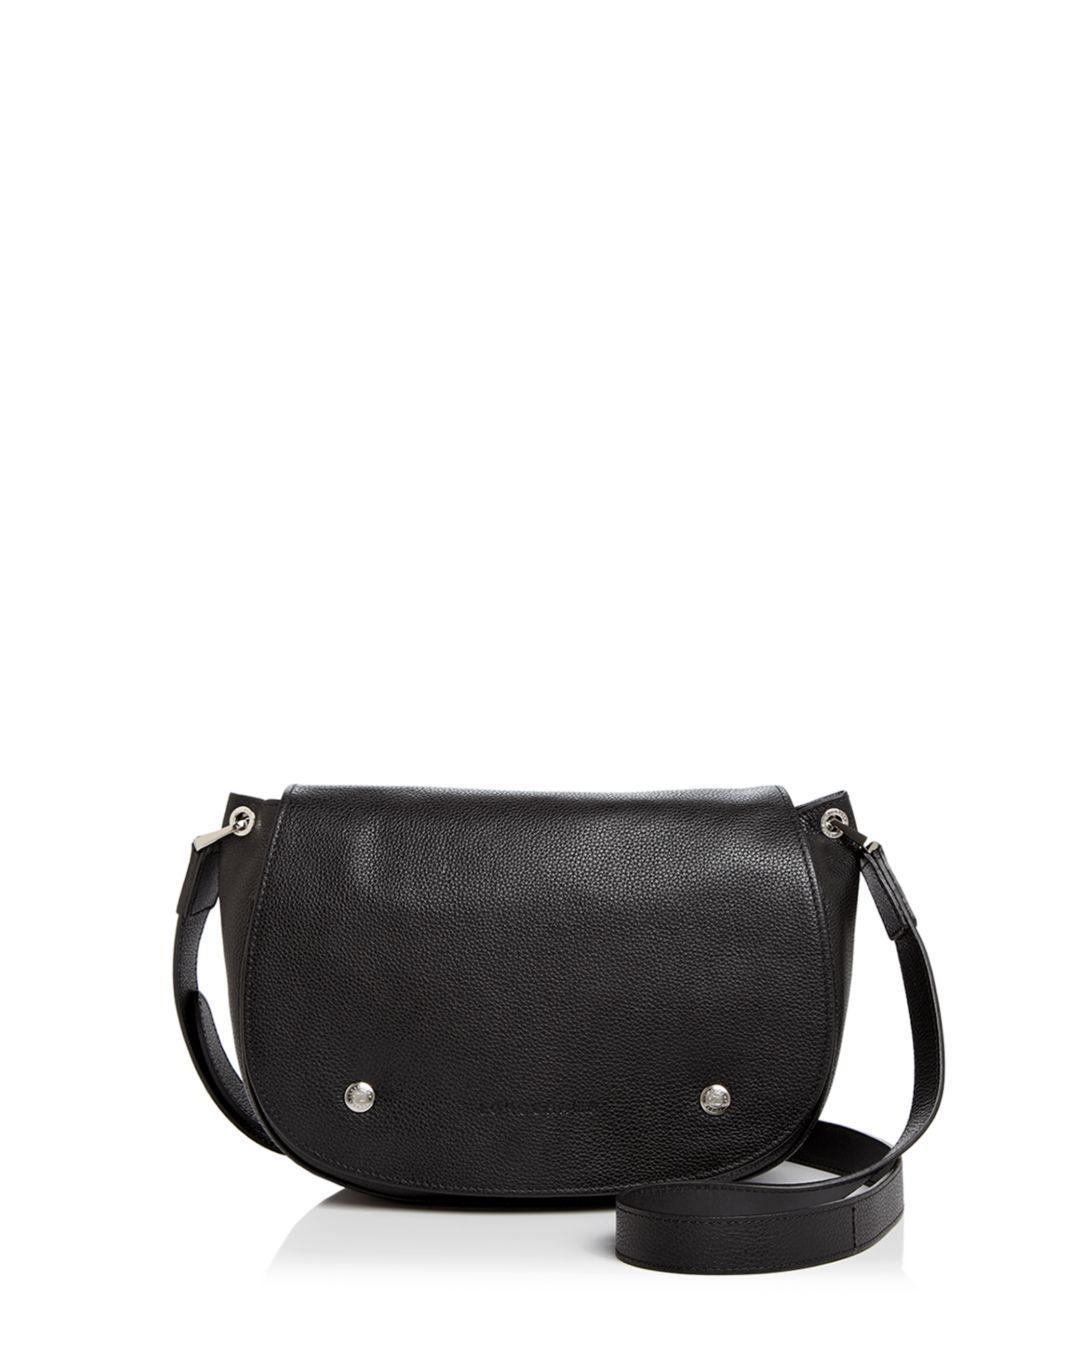 64641e0ed3c6 Lyst - Longchamp Le Foulonne Leather Saddle Bag in Black